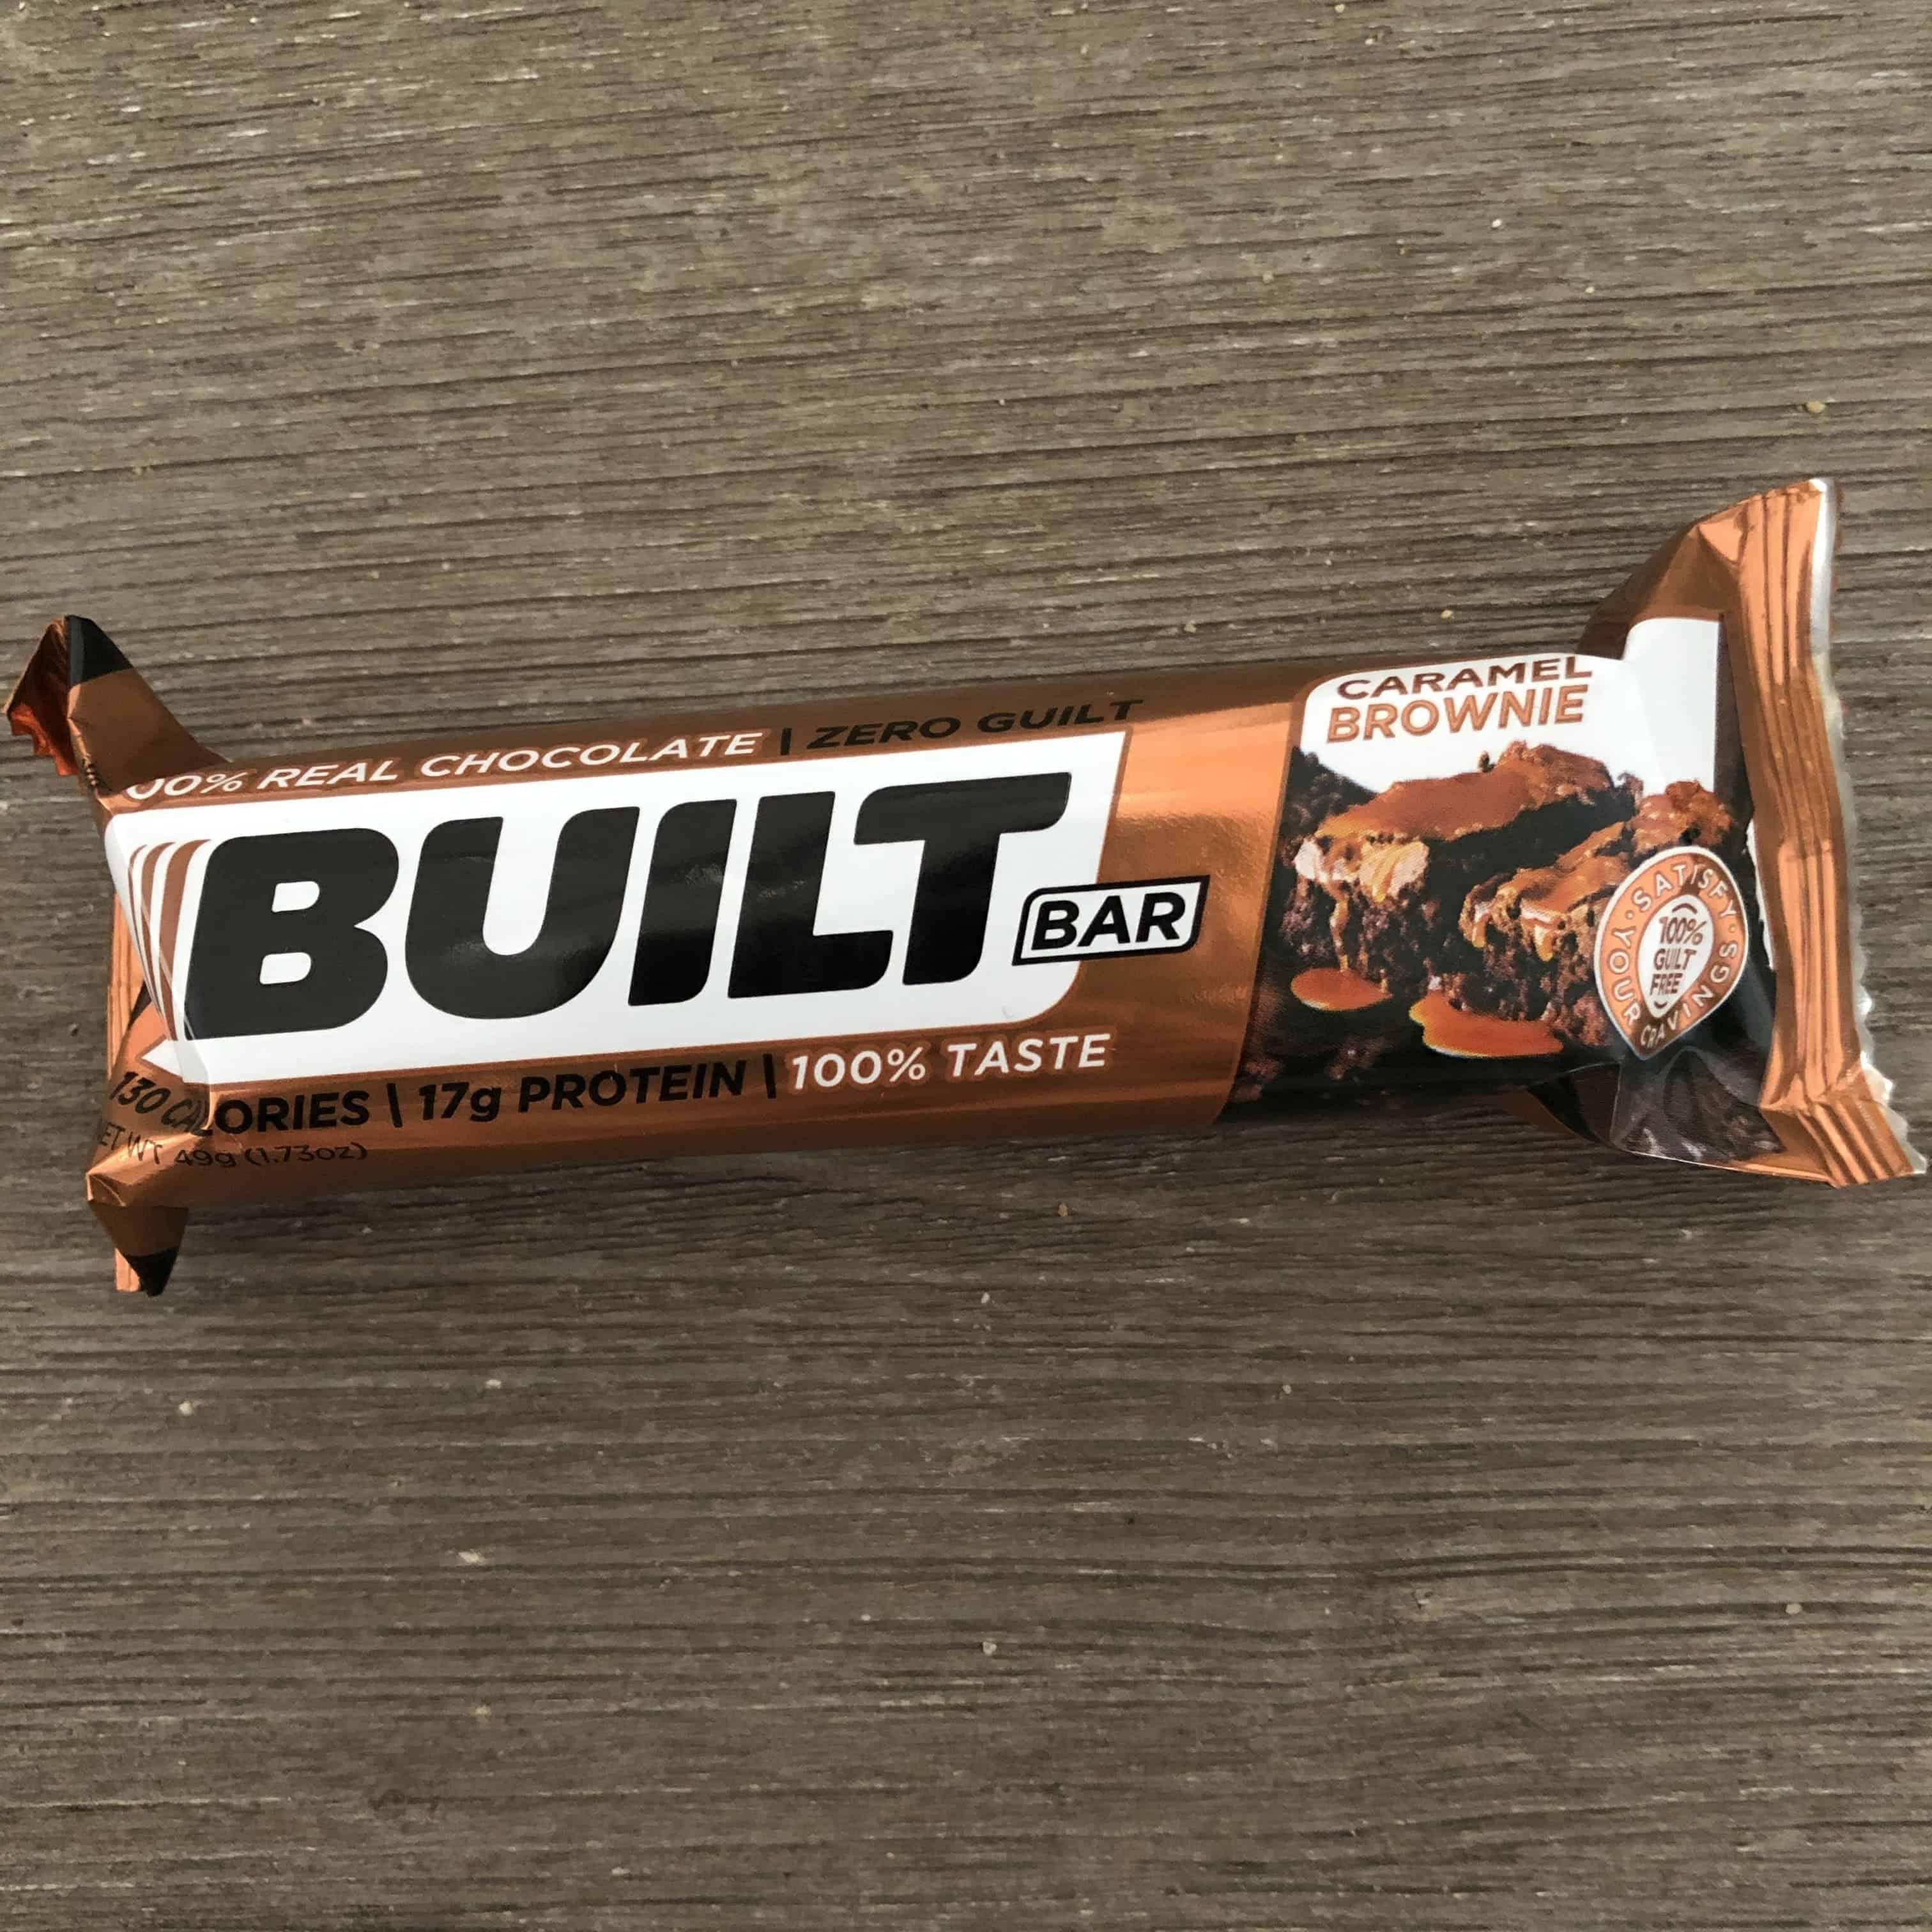 carmel brownie builtbar